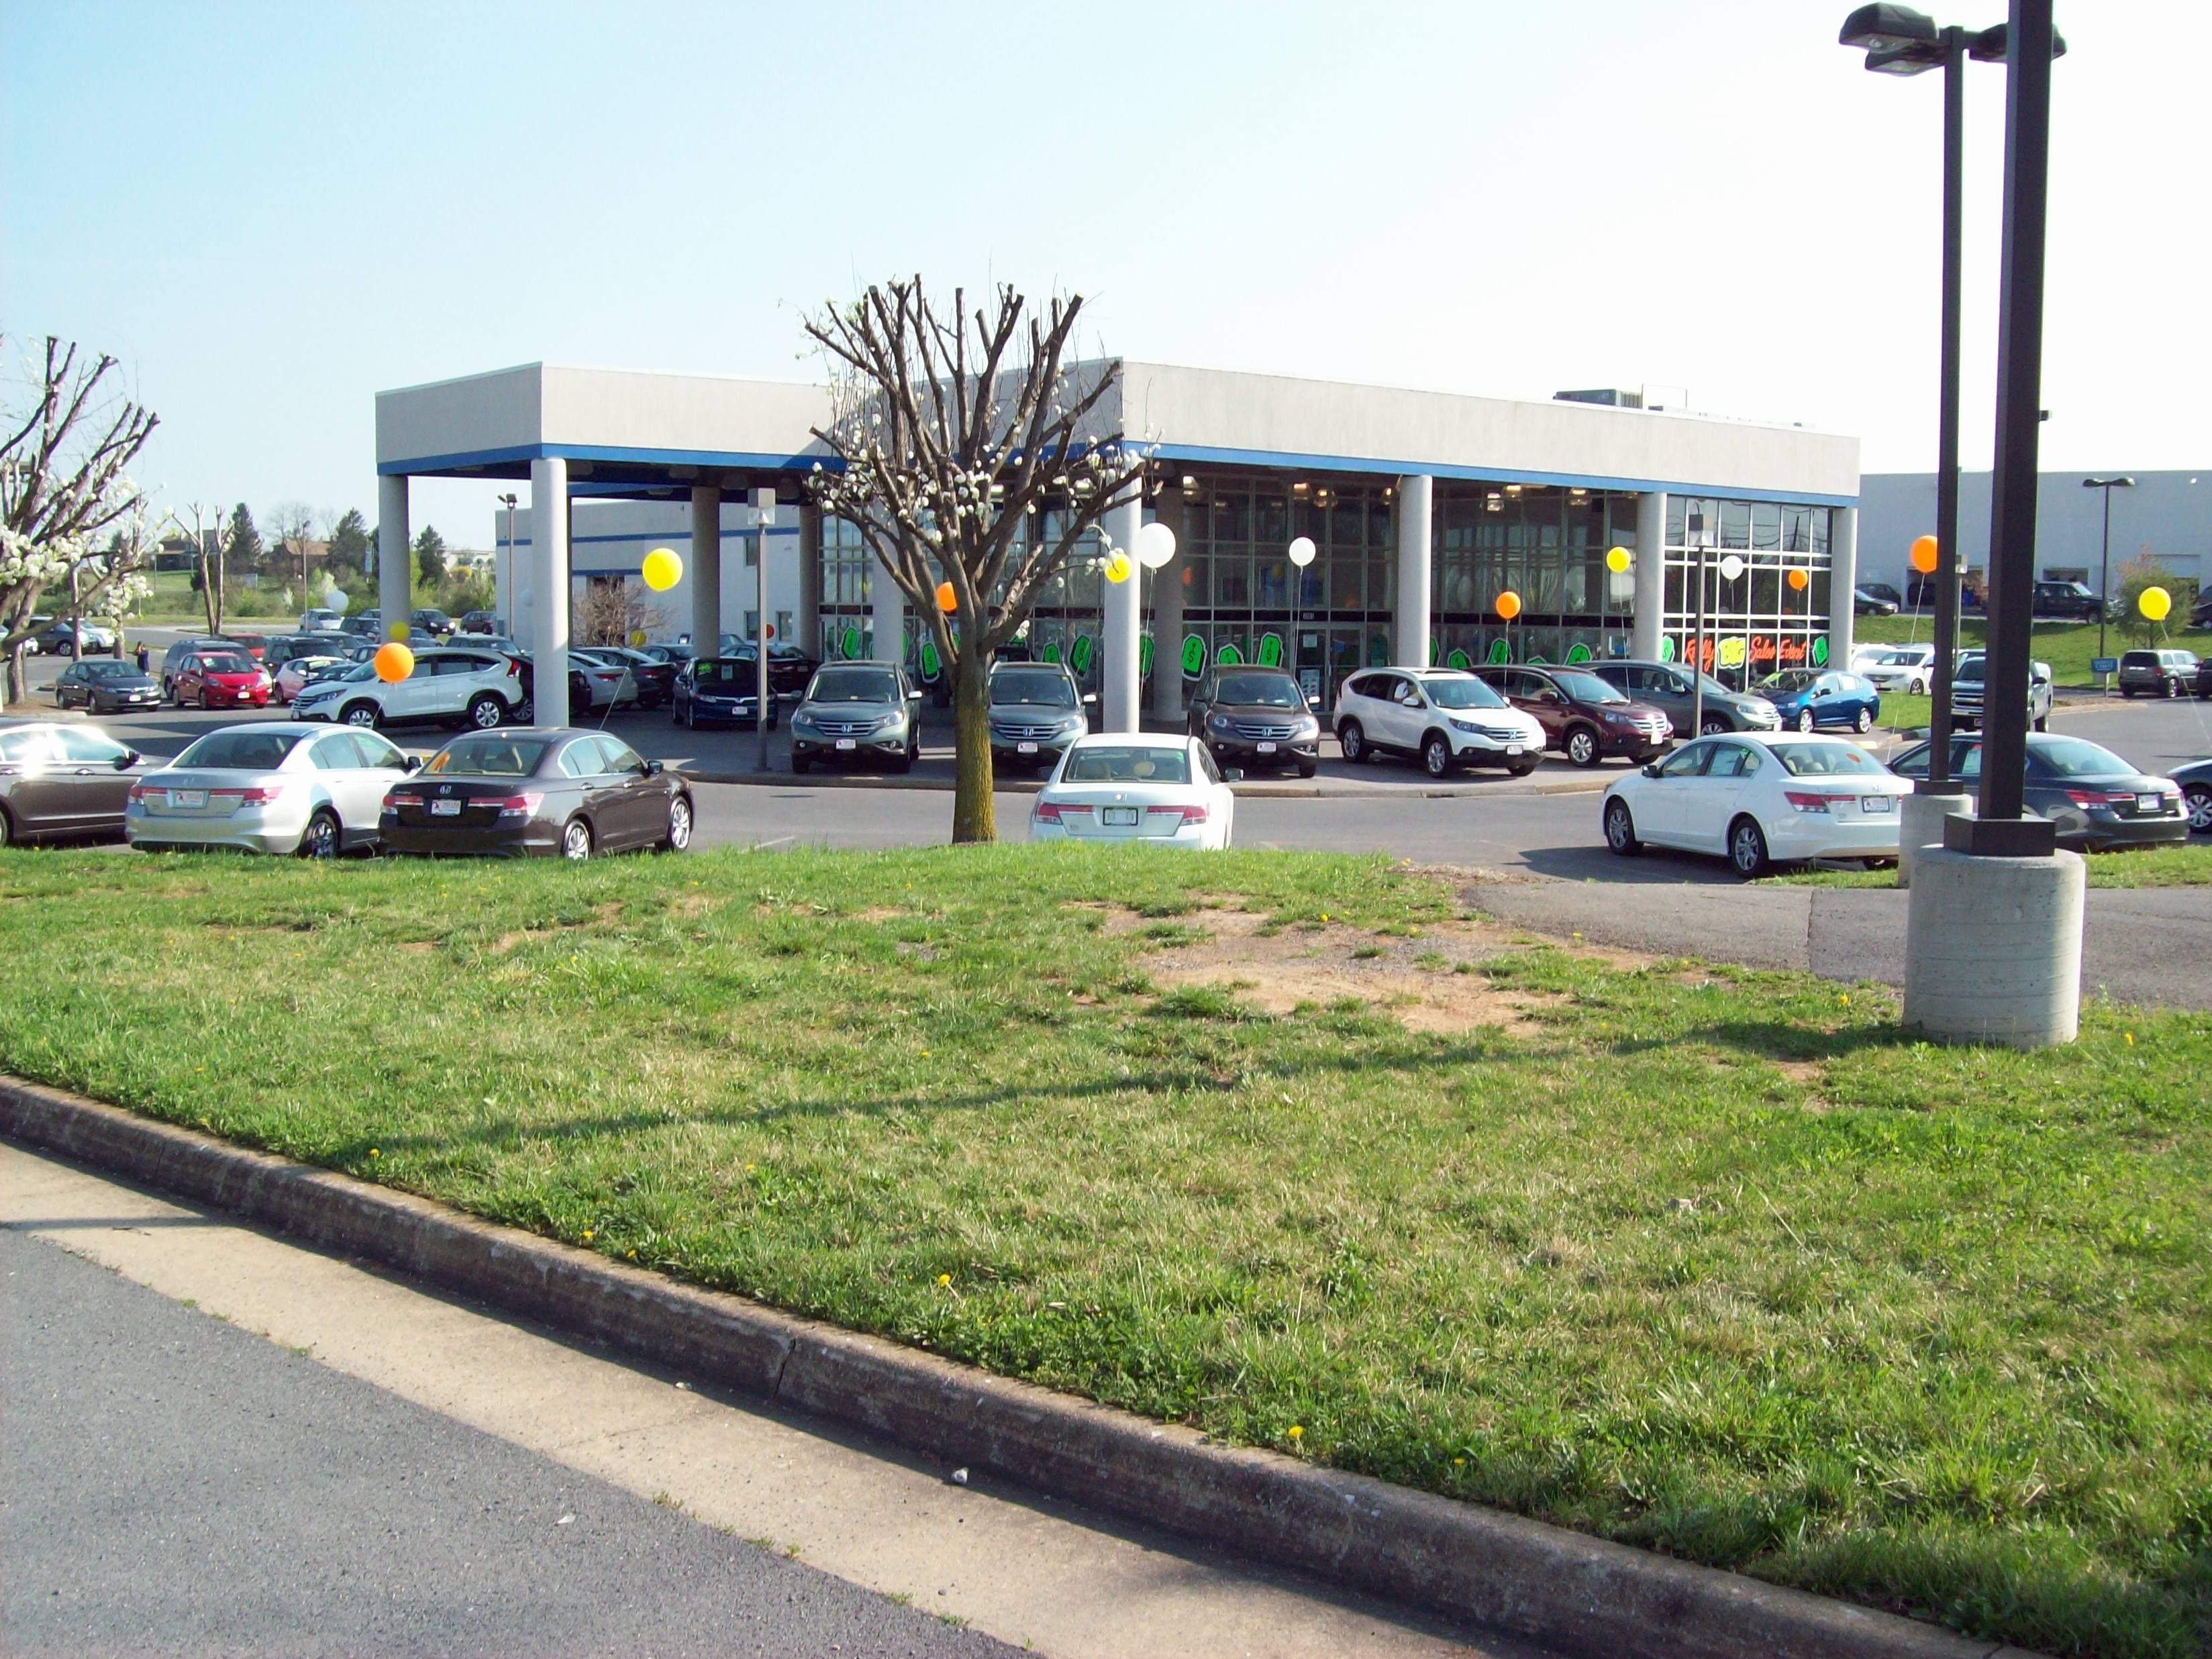 Honda Dealer In Hagerstown Md ... 1057kB, Honda Dealership In Winchester Va Miller Honda | Review Ebooks